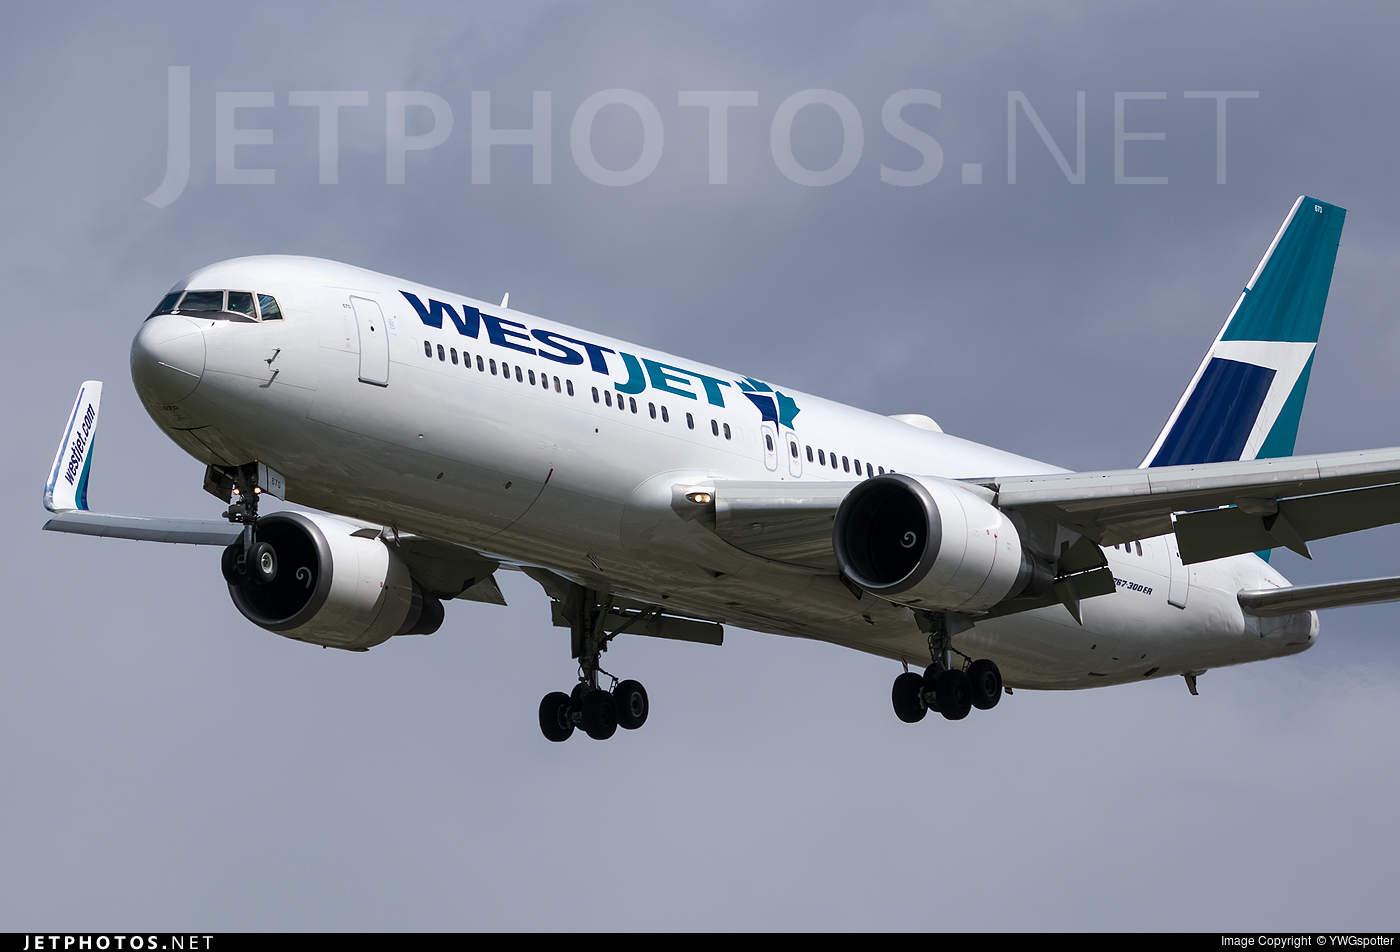 Passengers surprised by lack of free meal on Trans-Atlantic WestJet flight